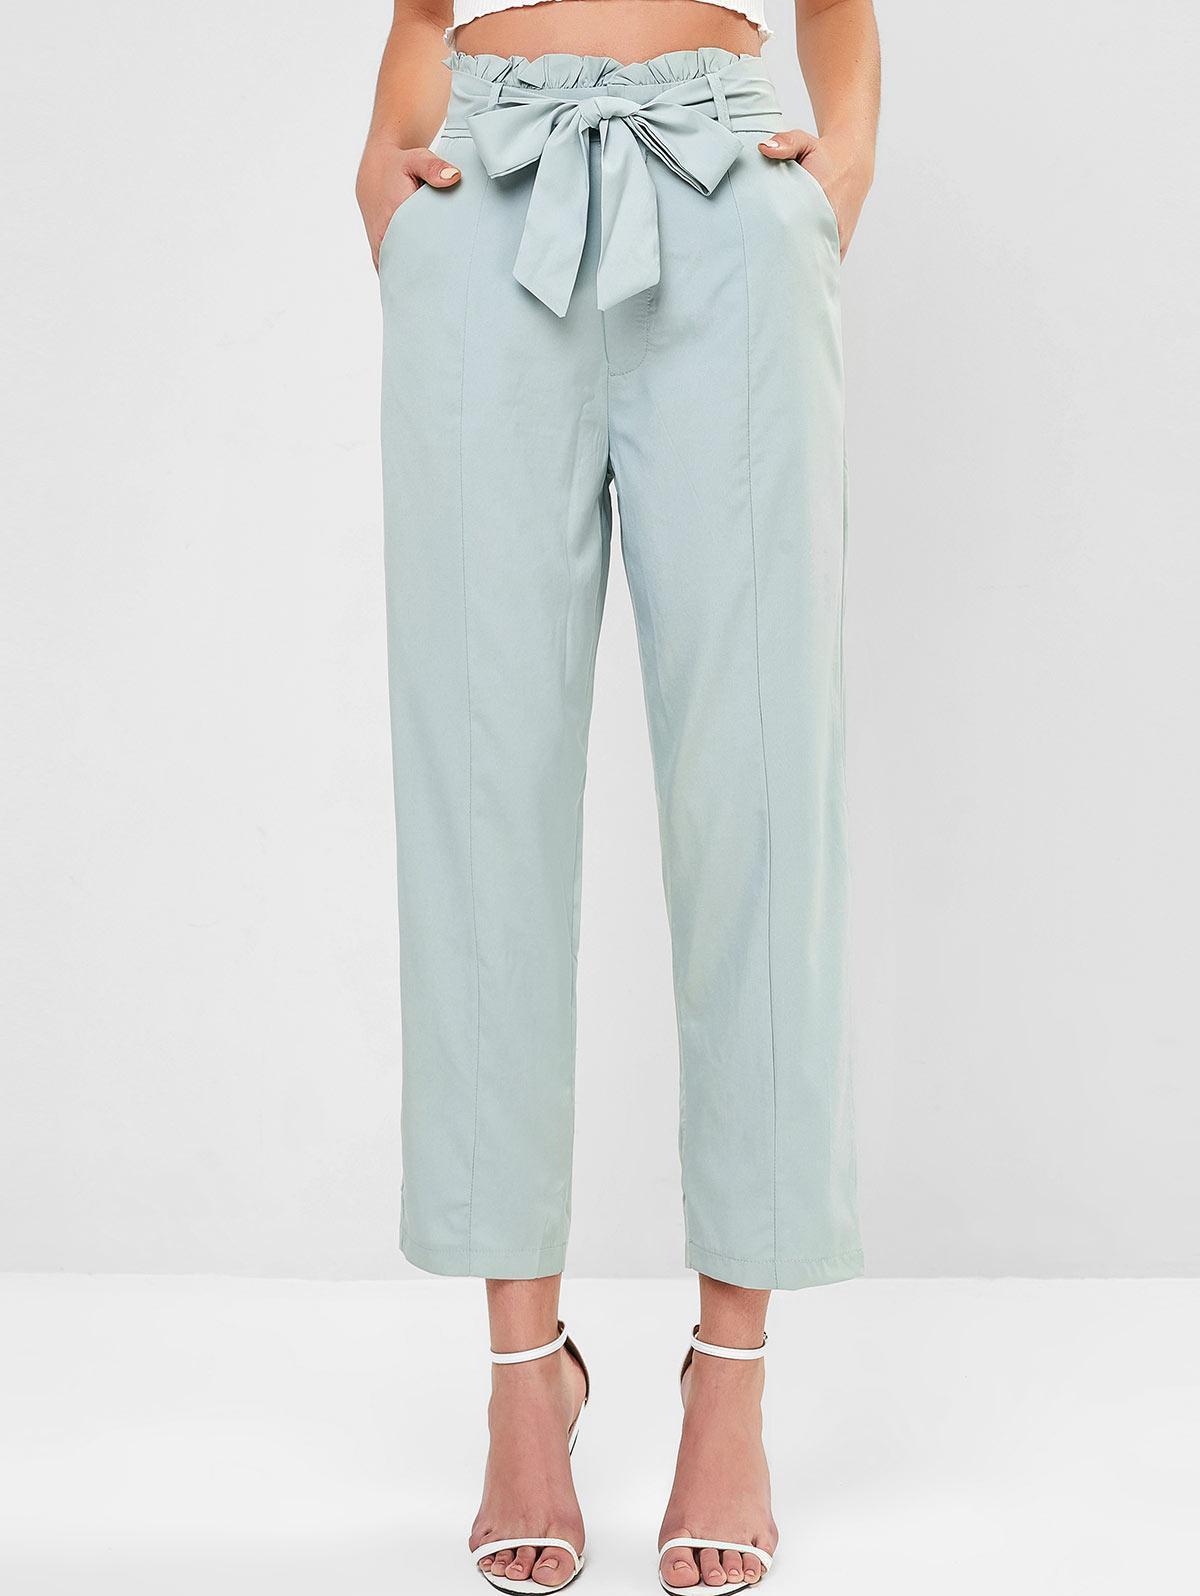 Pocket Peg Leg Paperbag Pants